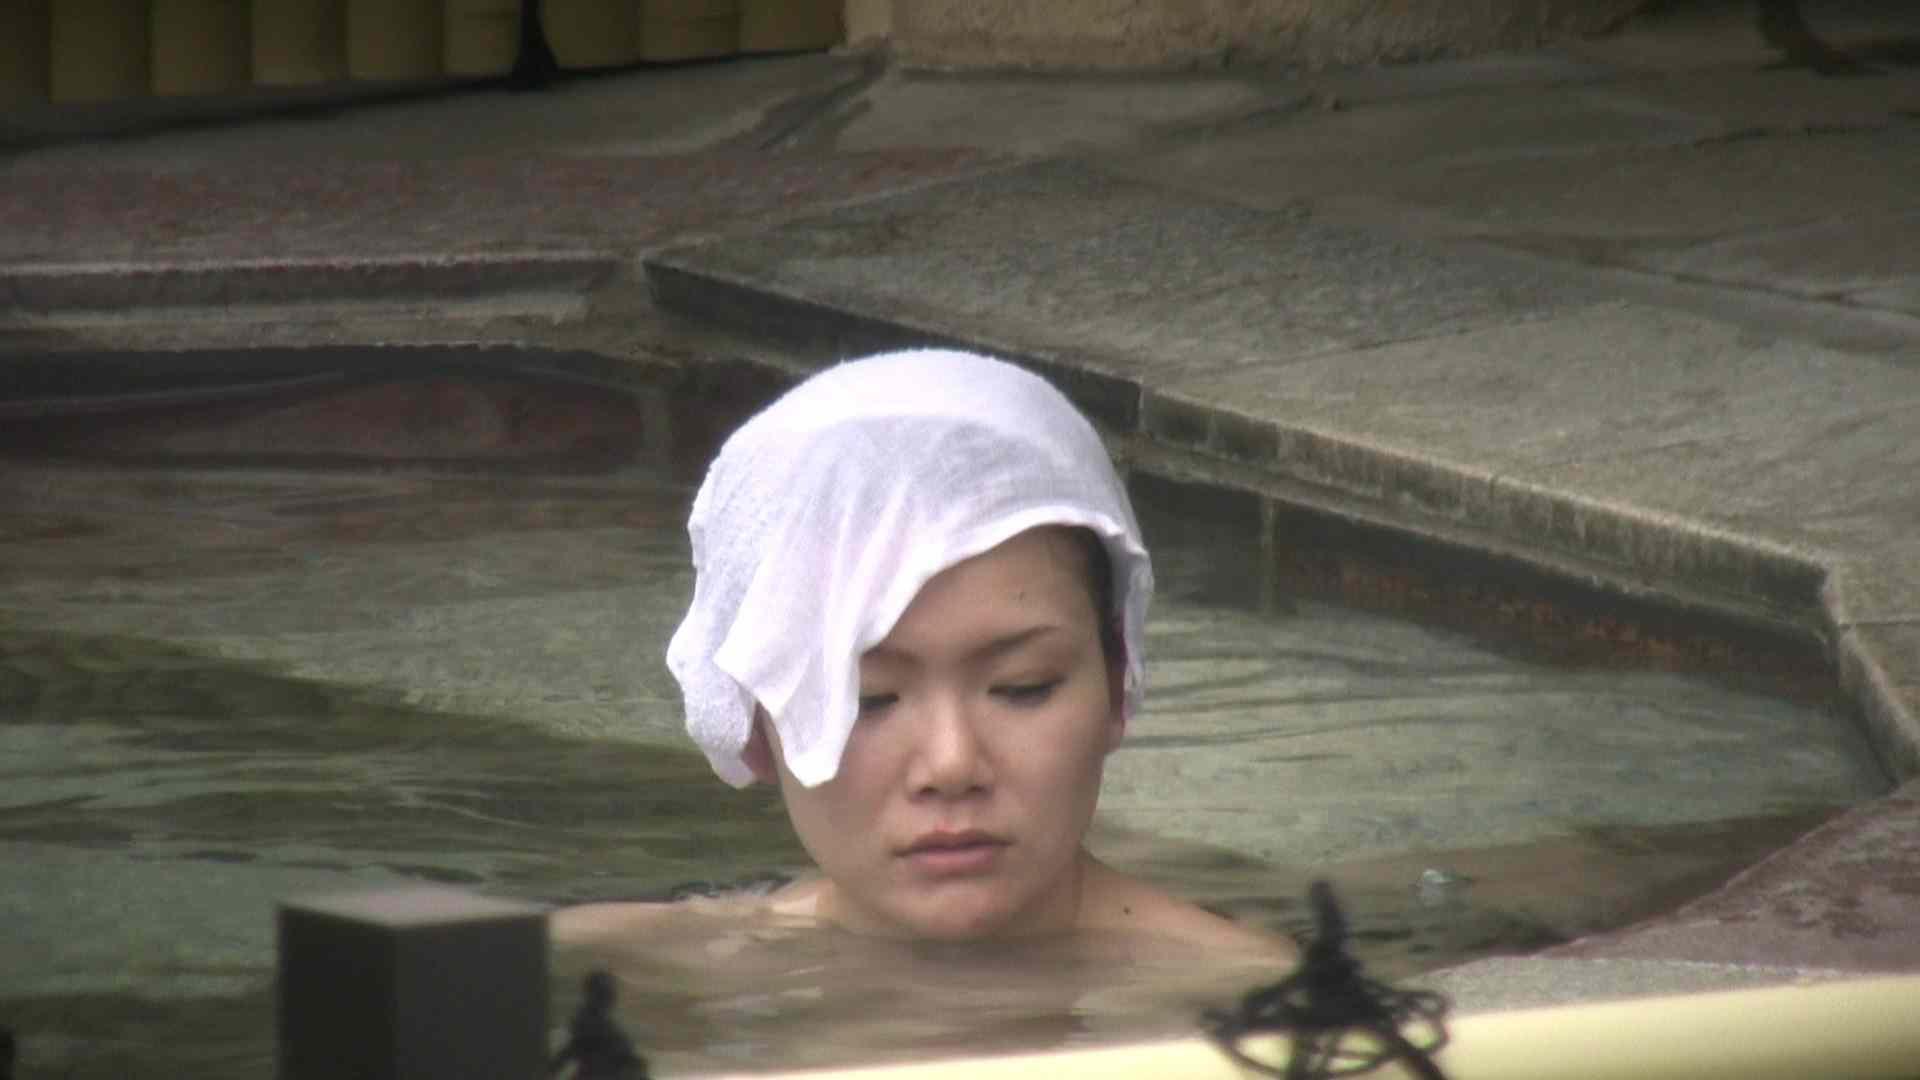 Aquaな露天風呂Vol.12【VIP】 綺麗なOLたち | 盗撮  84枚 82